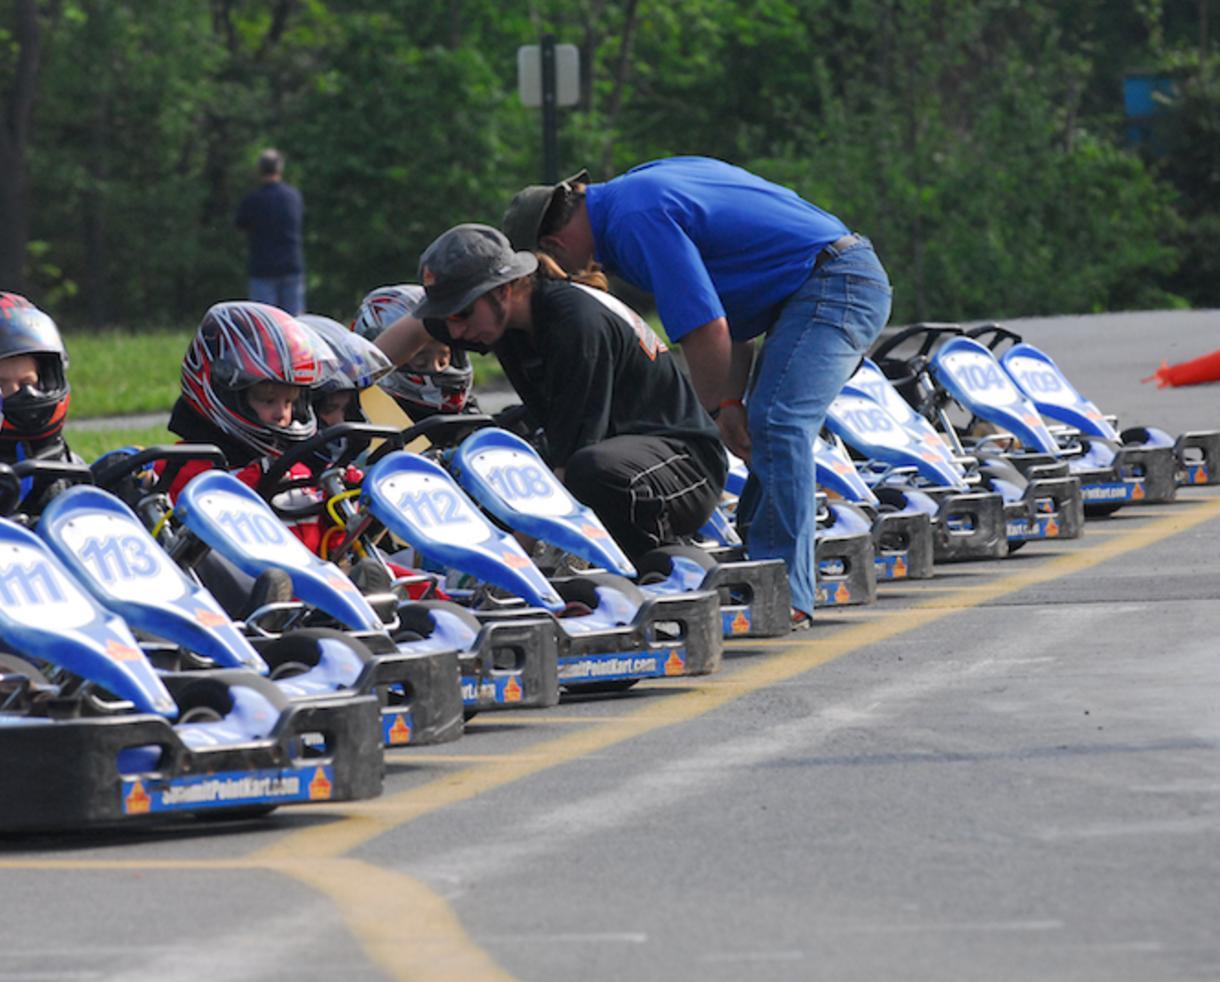 Deal: $183+ for 4-5 day Kids Kart Racing Spring Break/Summer Camps ...